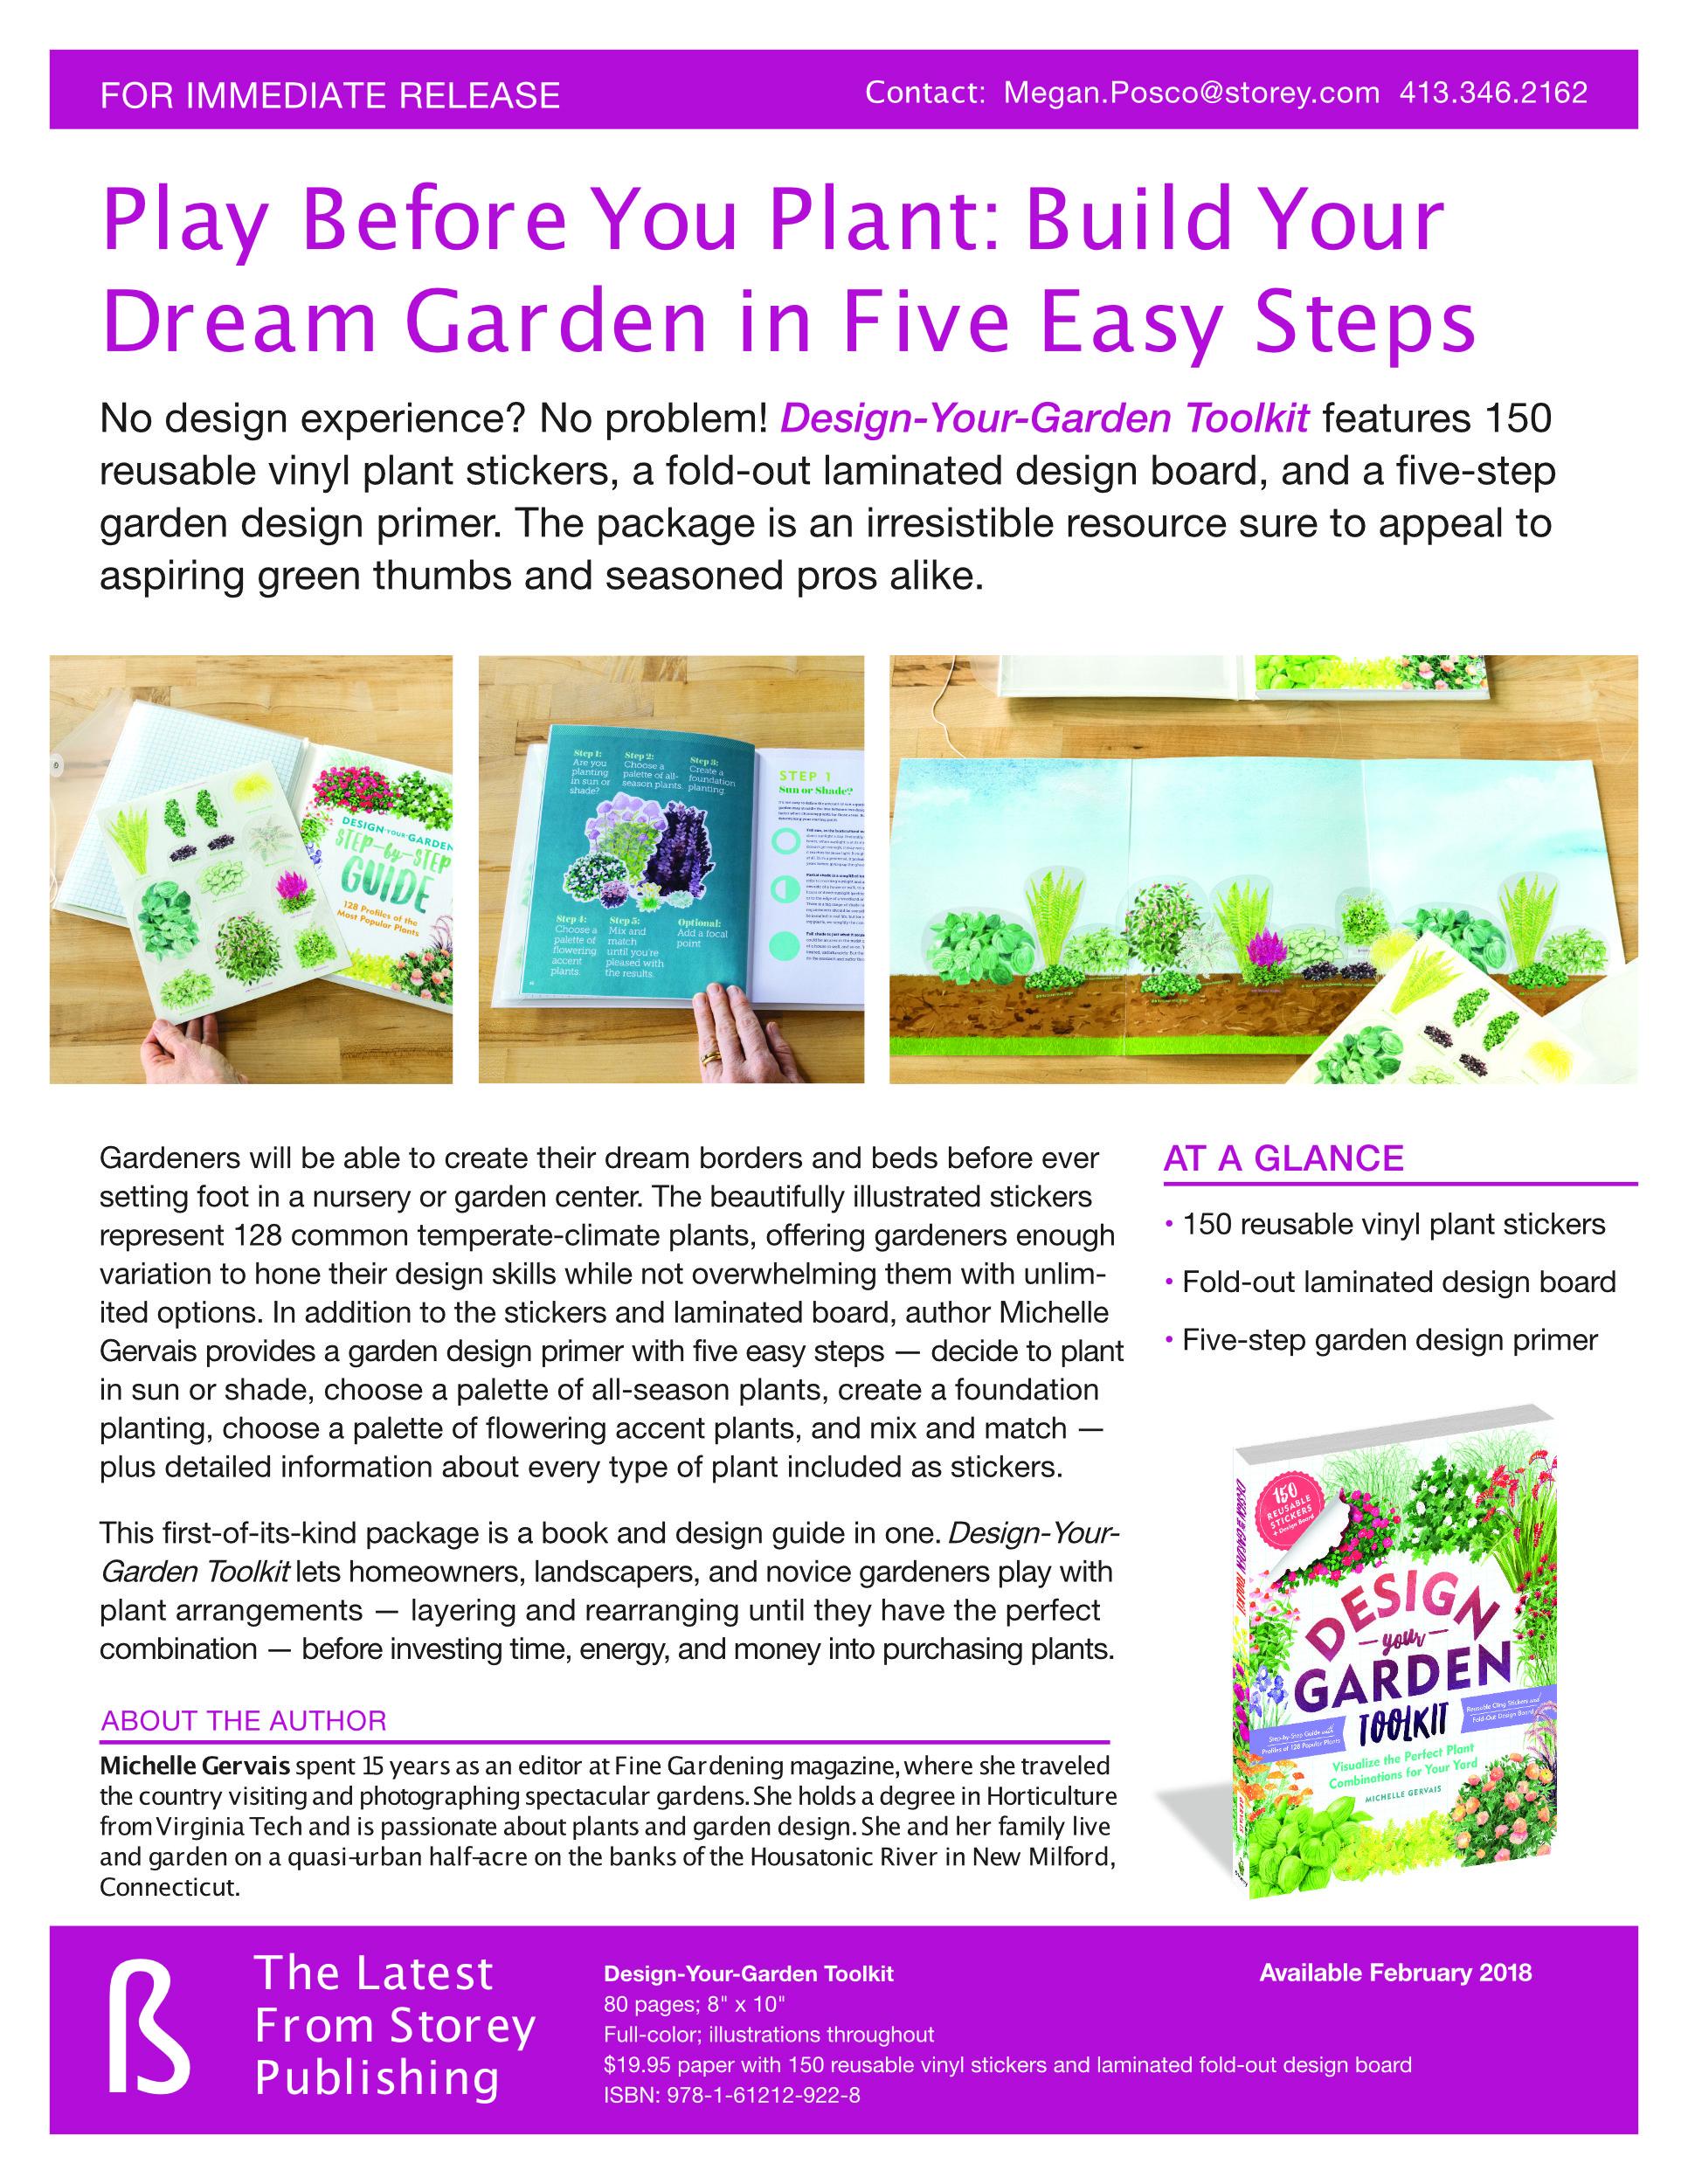 Design-Your-Garden-Press-Release-thumbnail.jpg